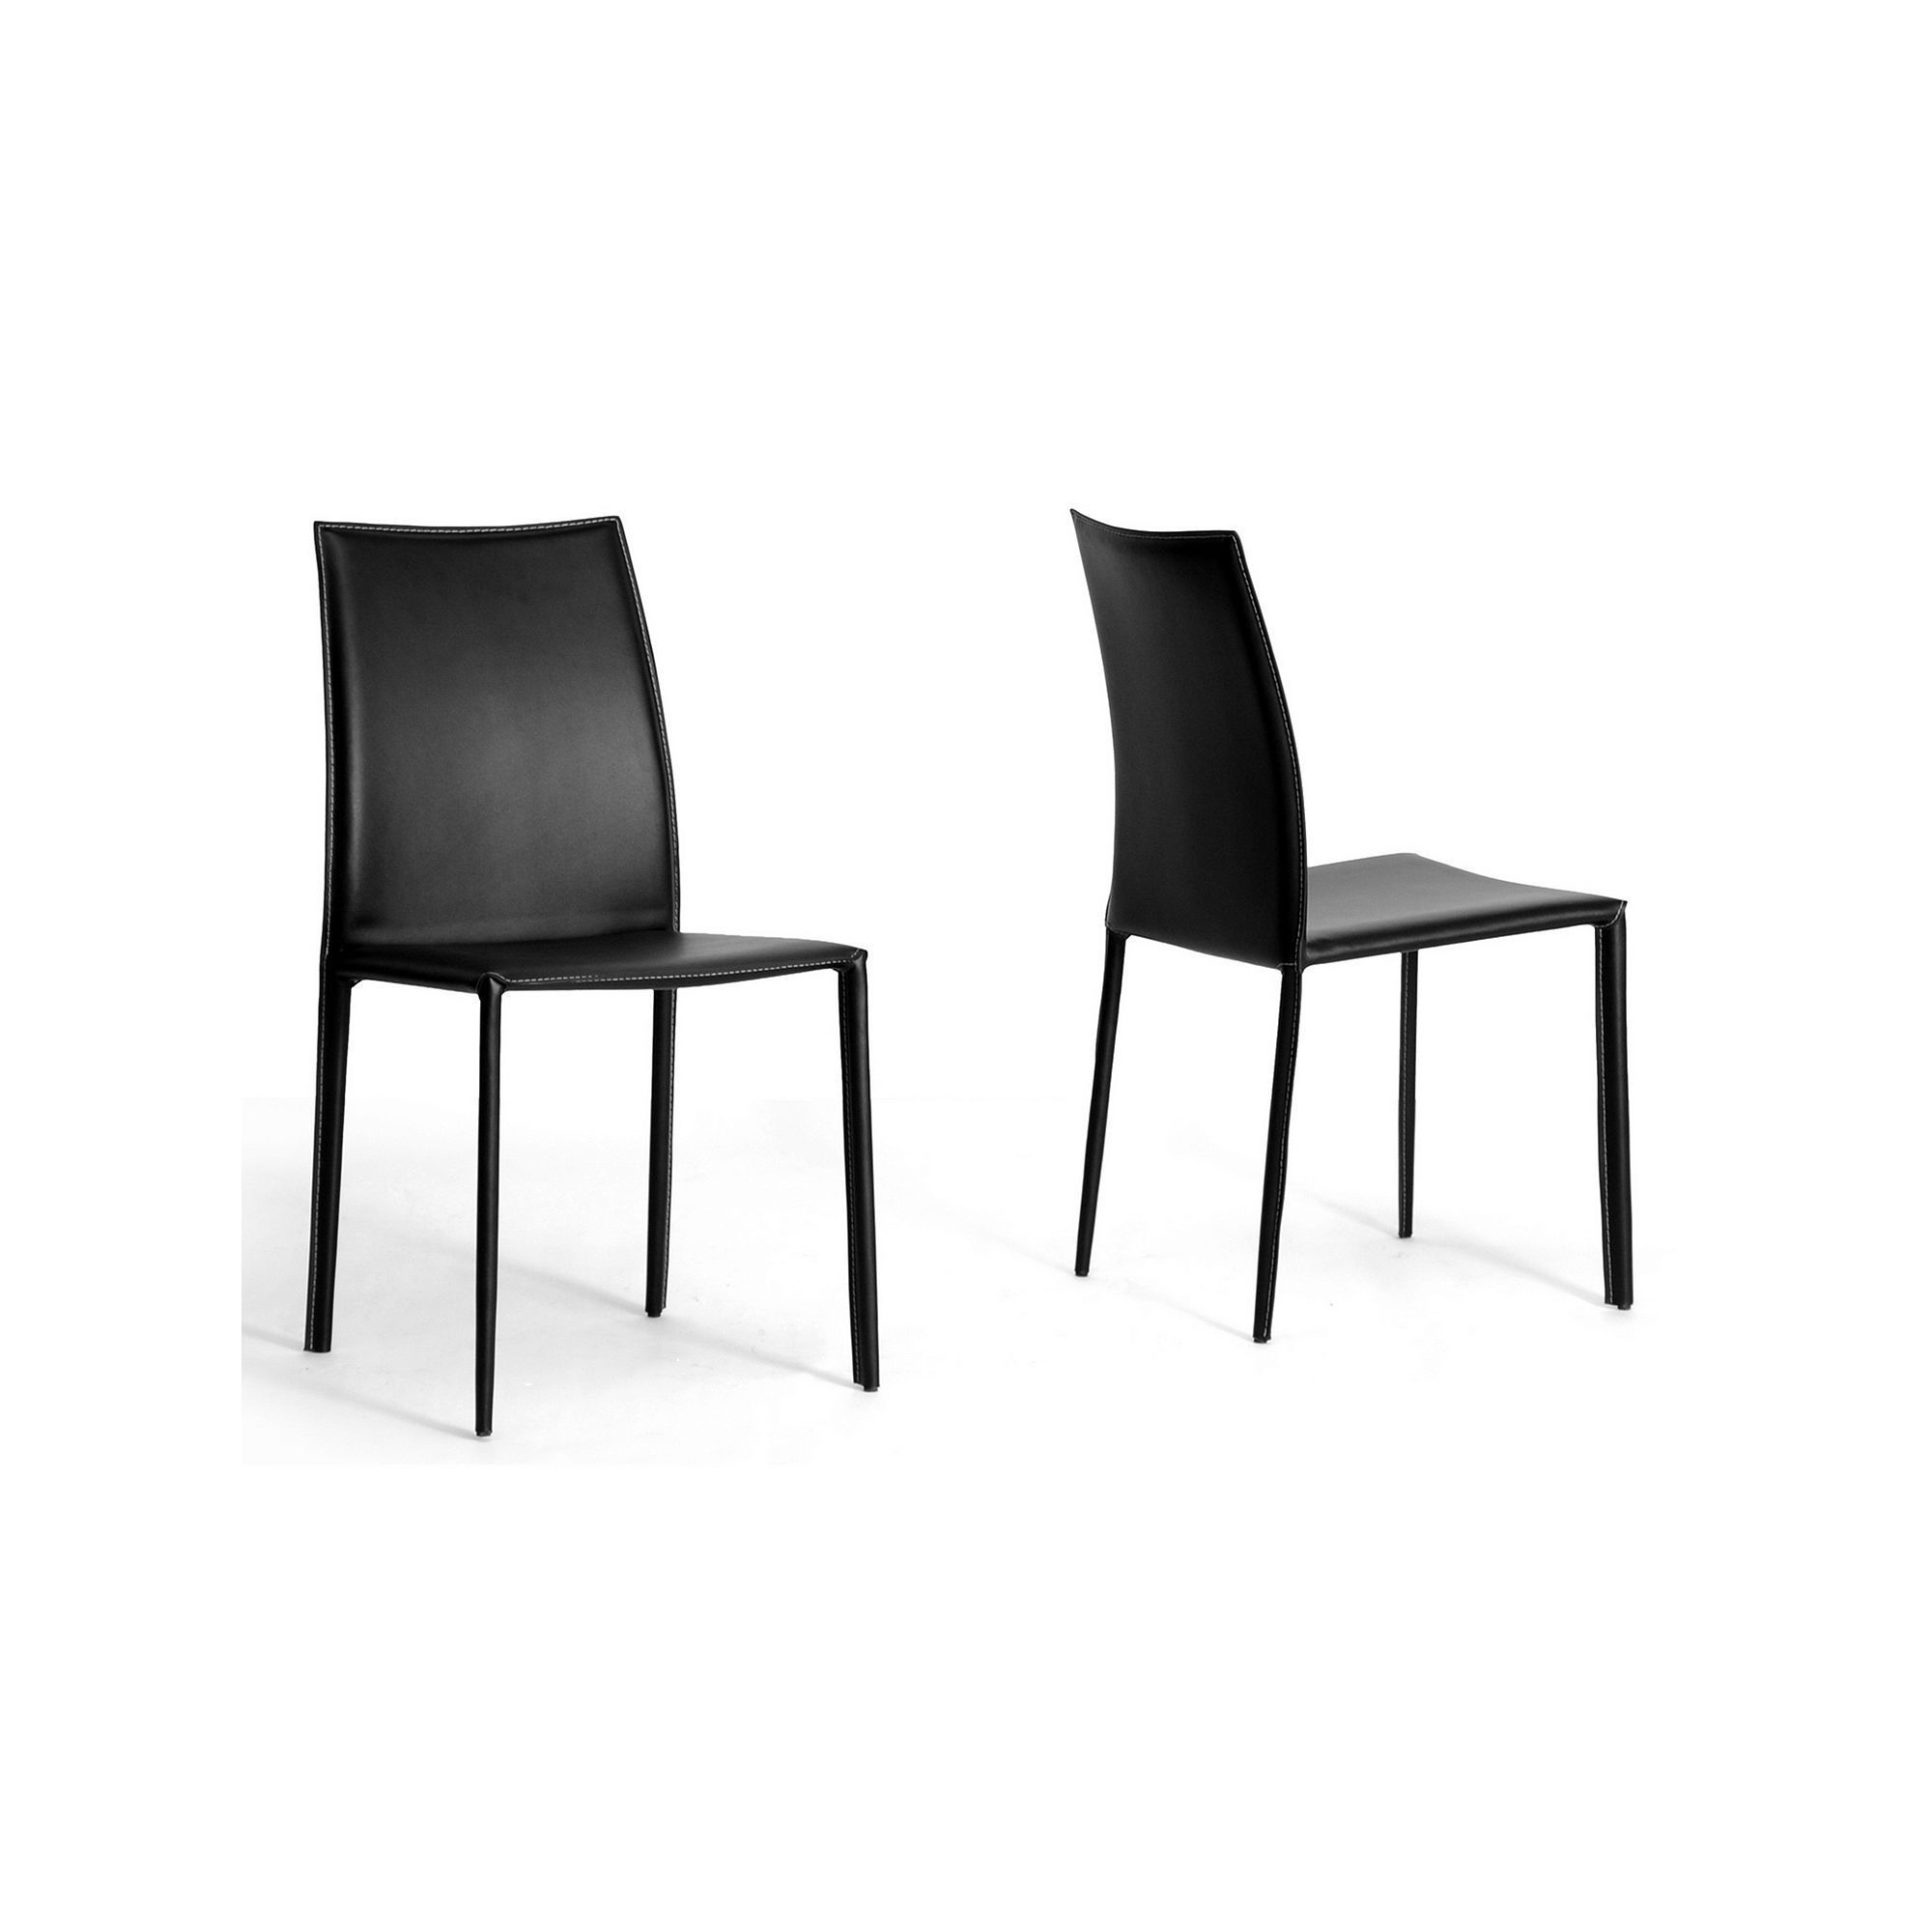 Baxton studio 2piece rockford leather dining chair set